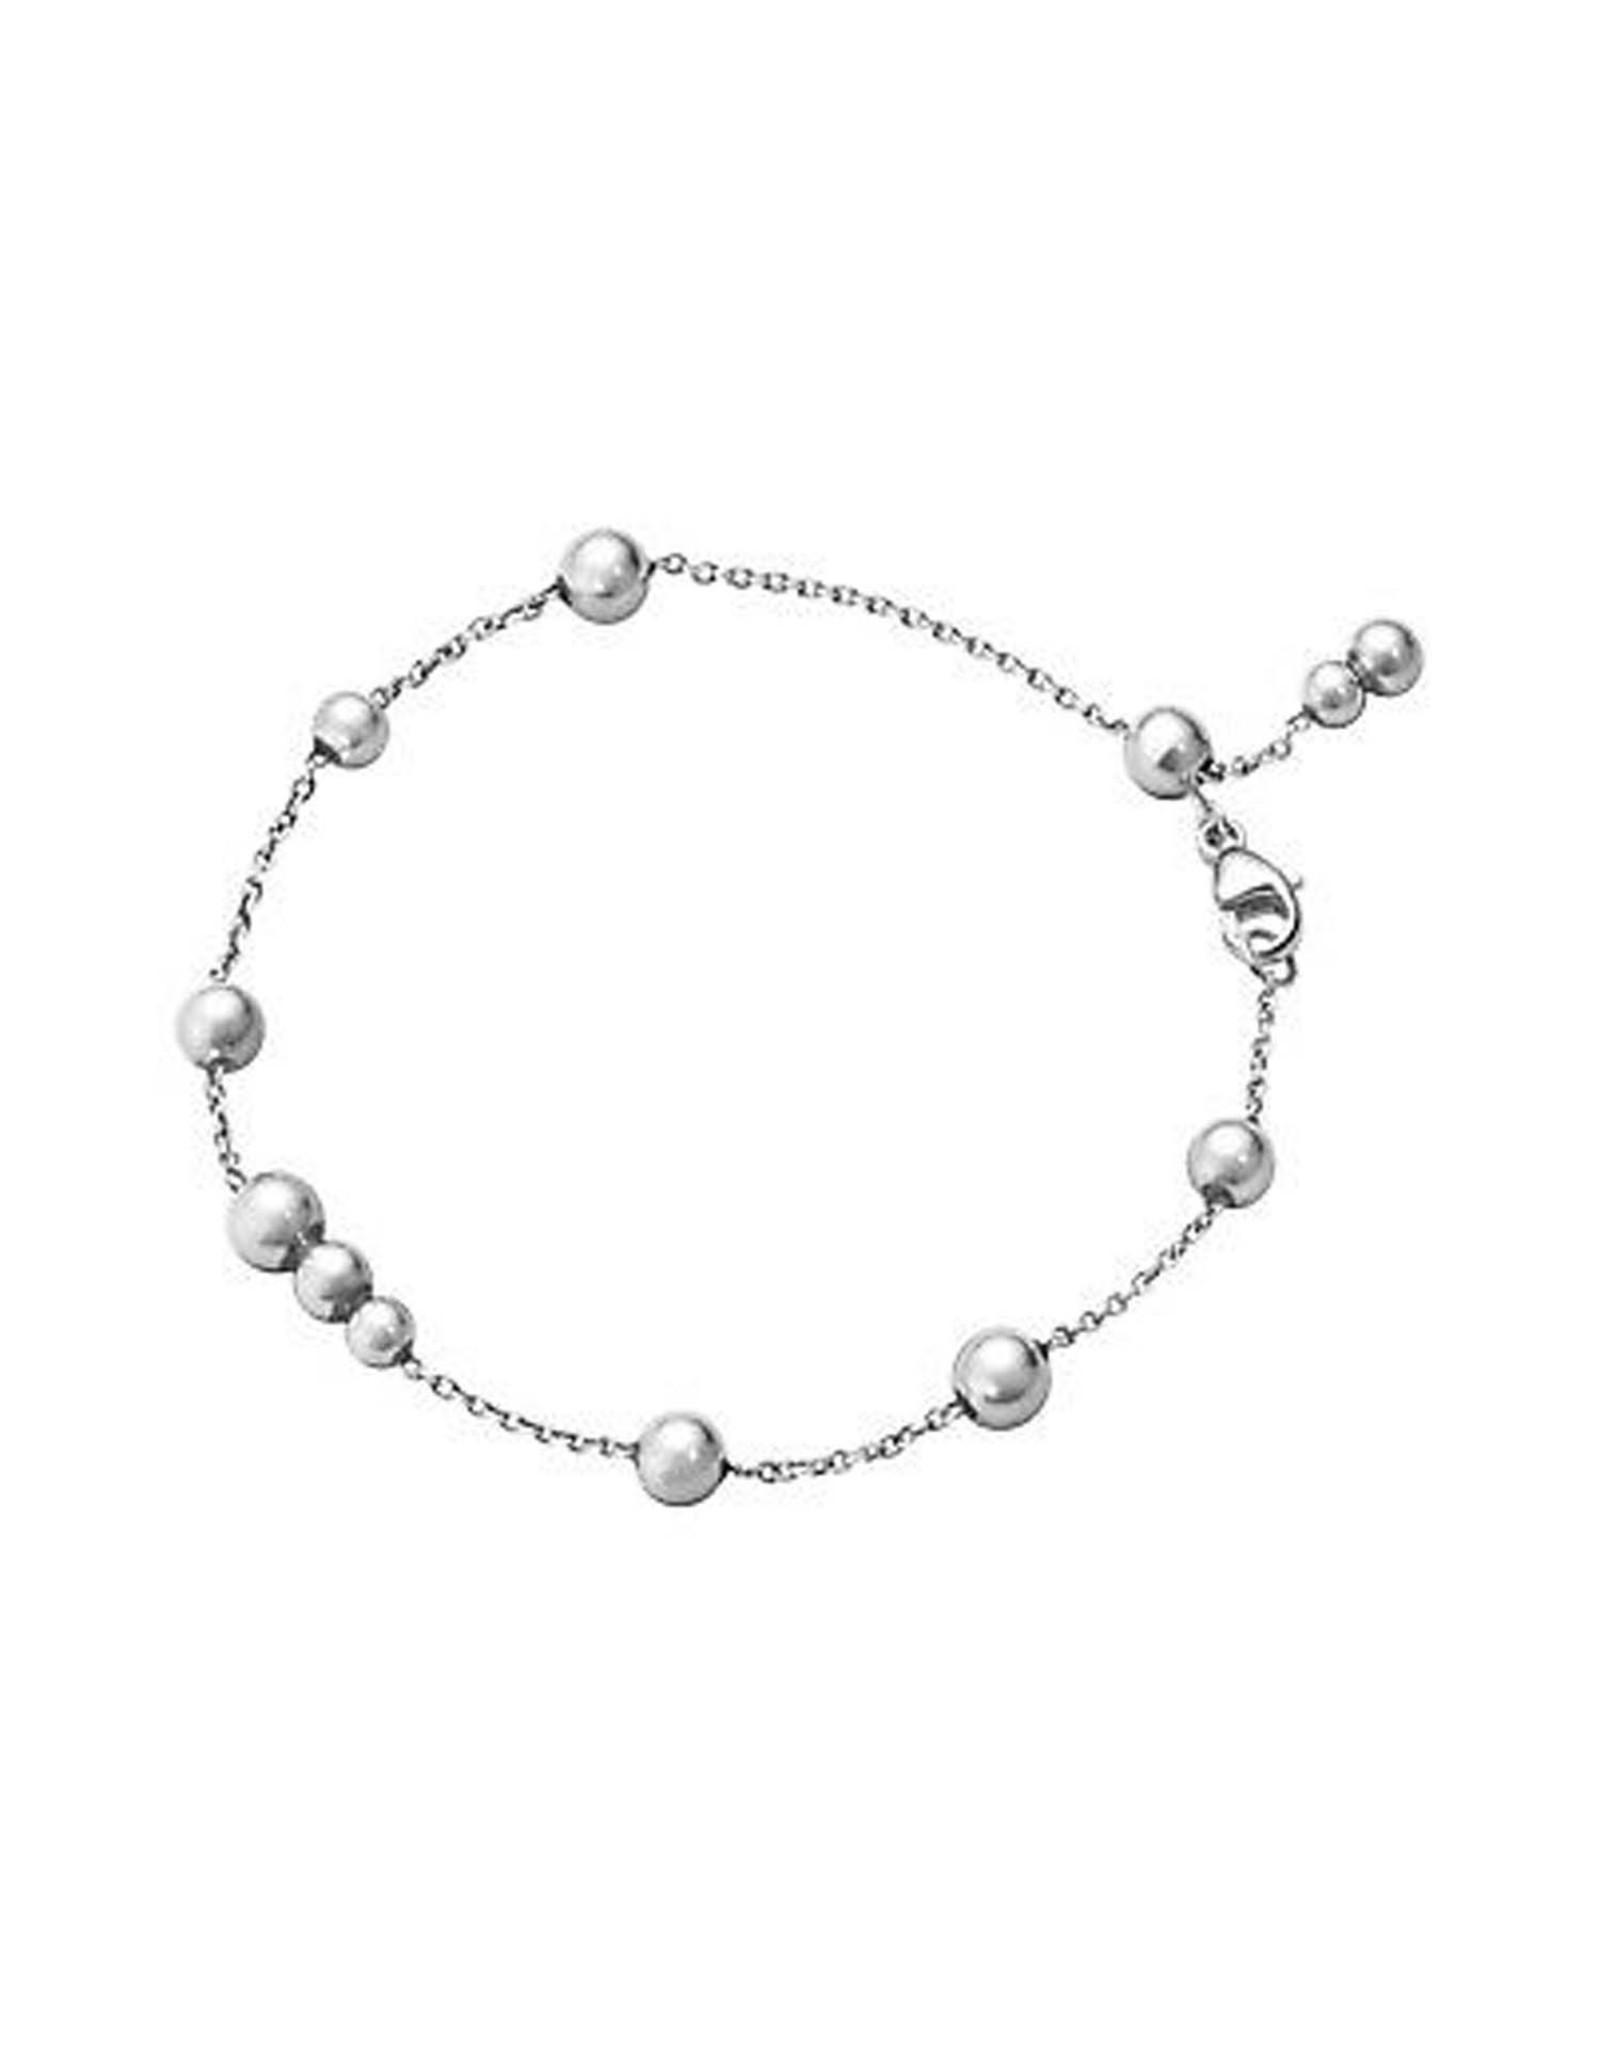 Georg Jensen Moonlight Grapes Bracelet, 551D, Silver